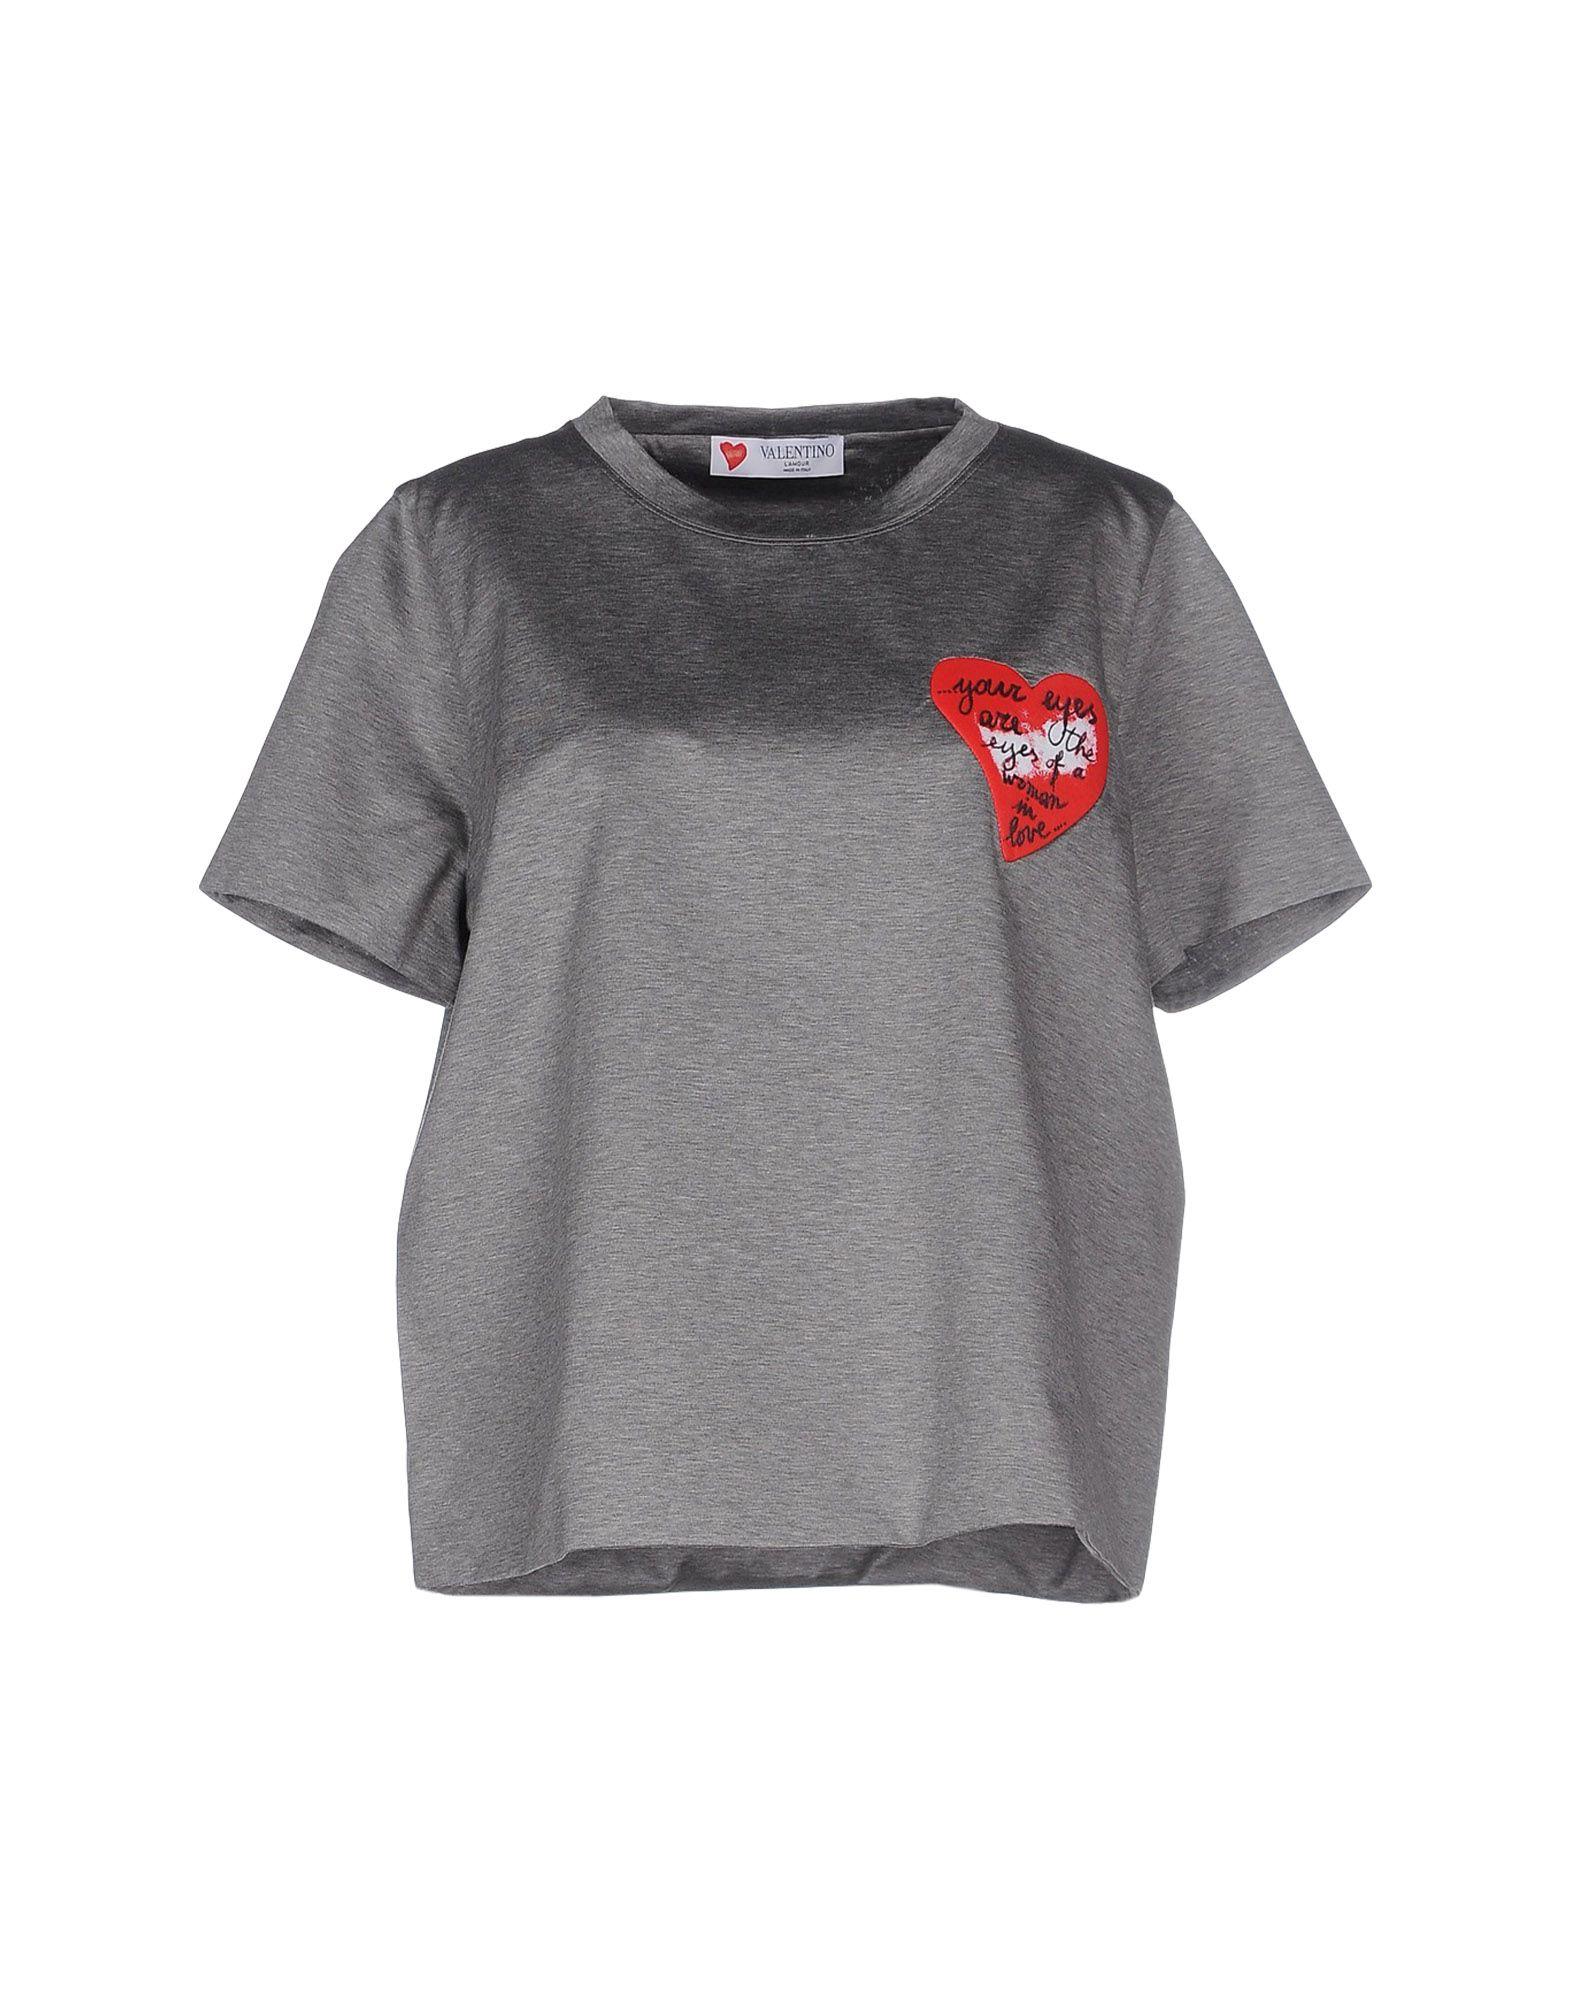 VALENTINO Damen T-shirts Farbe Grau Größe 6